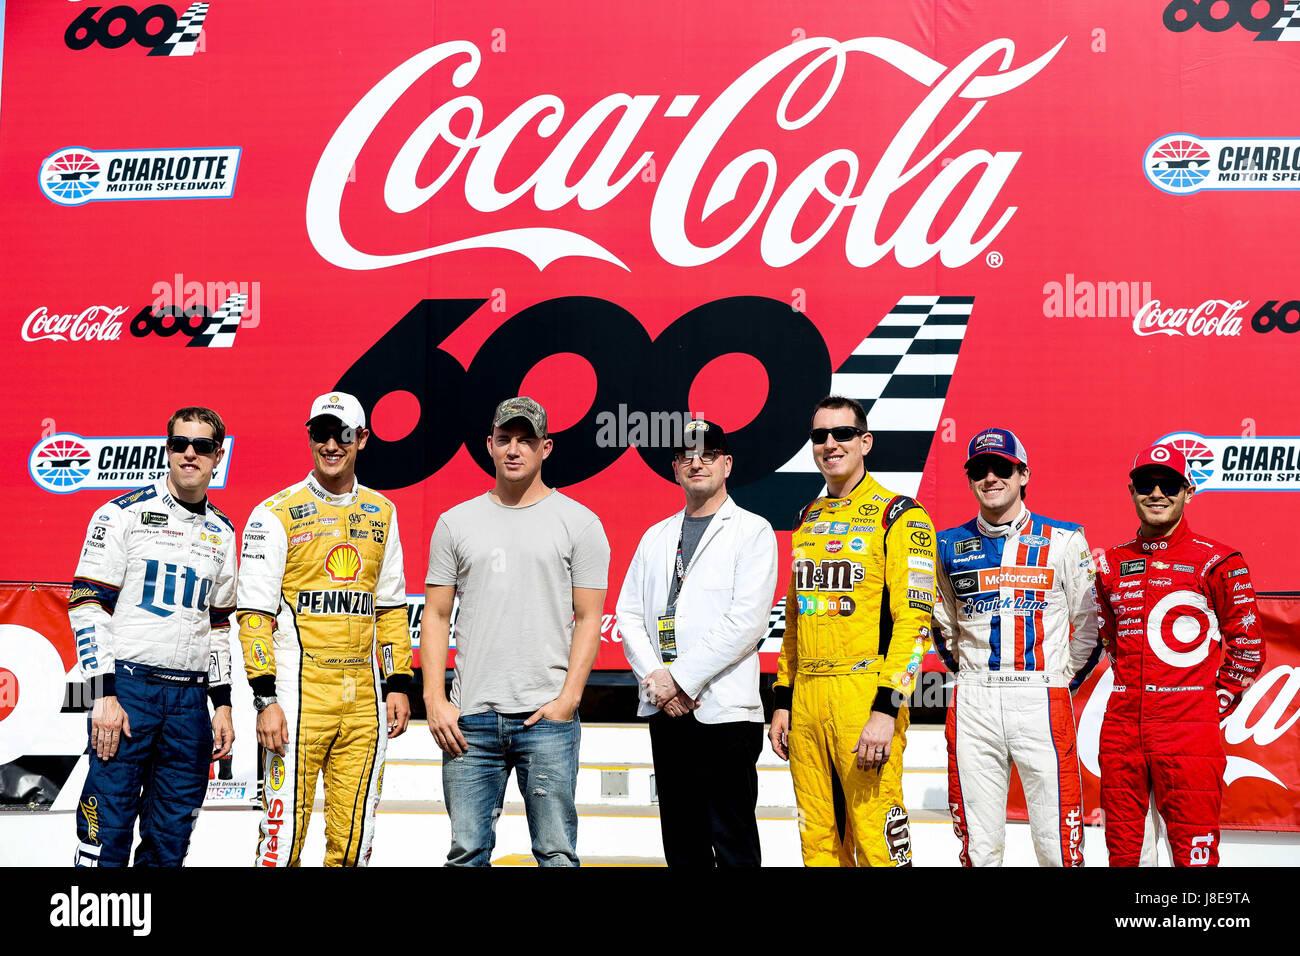 Charlotte, NC, USA. 28. Mai 2017. Grand Marshall Channing Tatum und Steven Soderbergh posieren mit Monster Energy Stockfoto